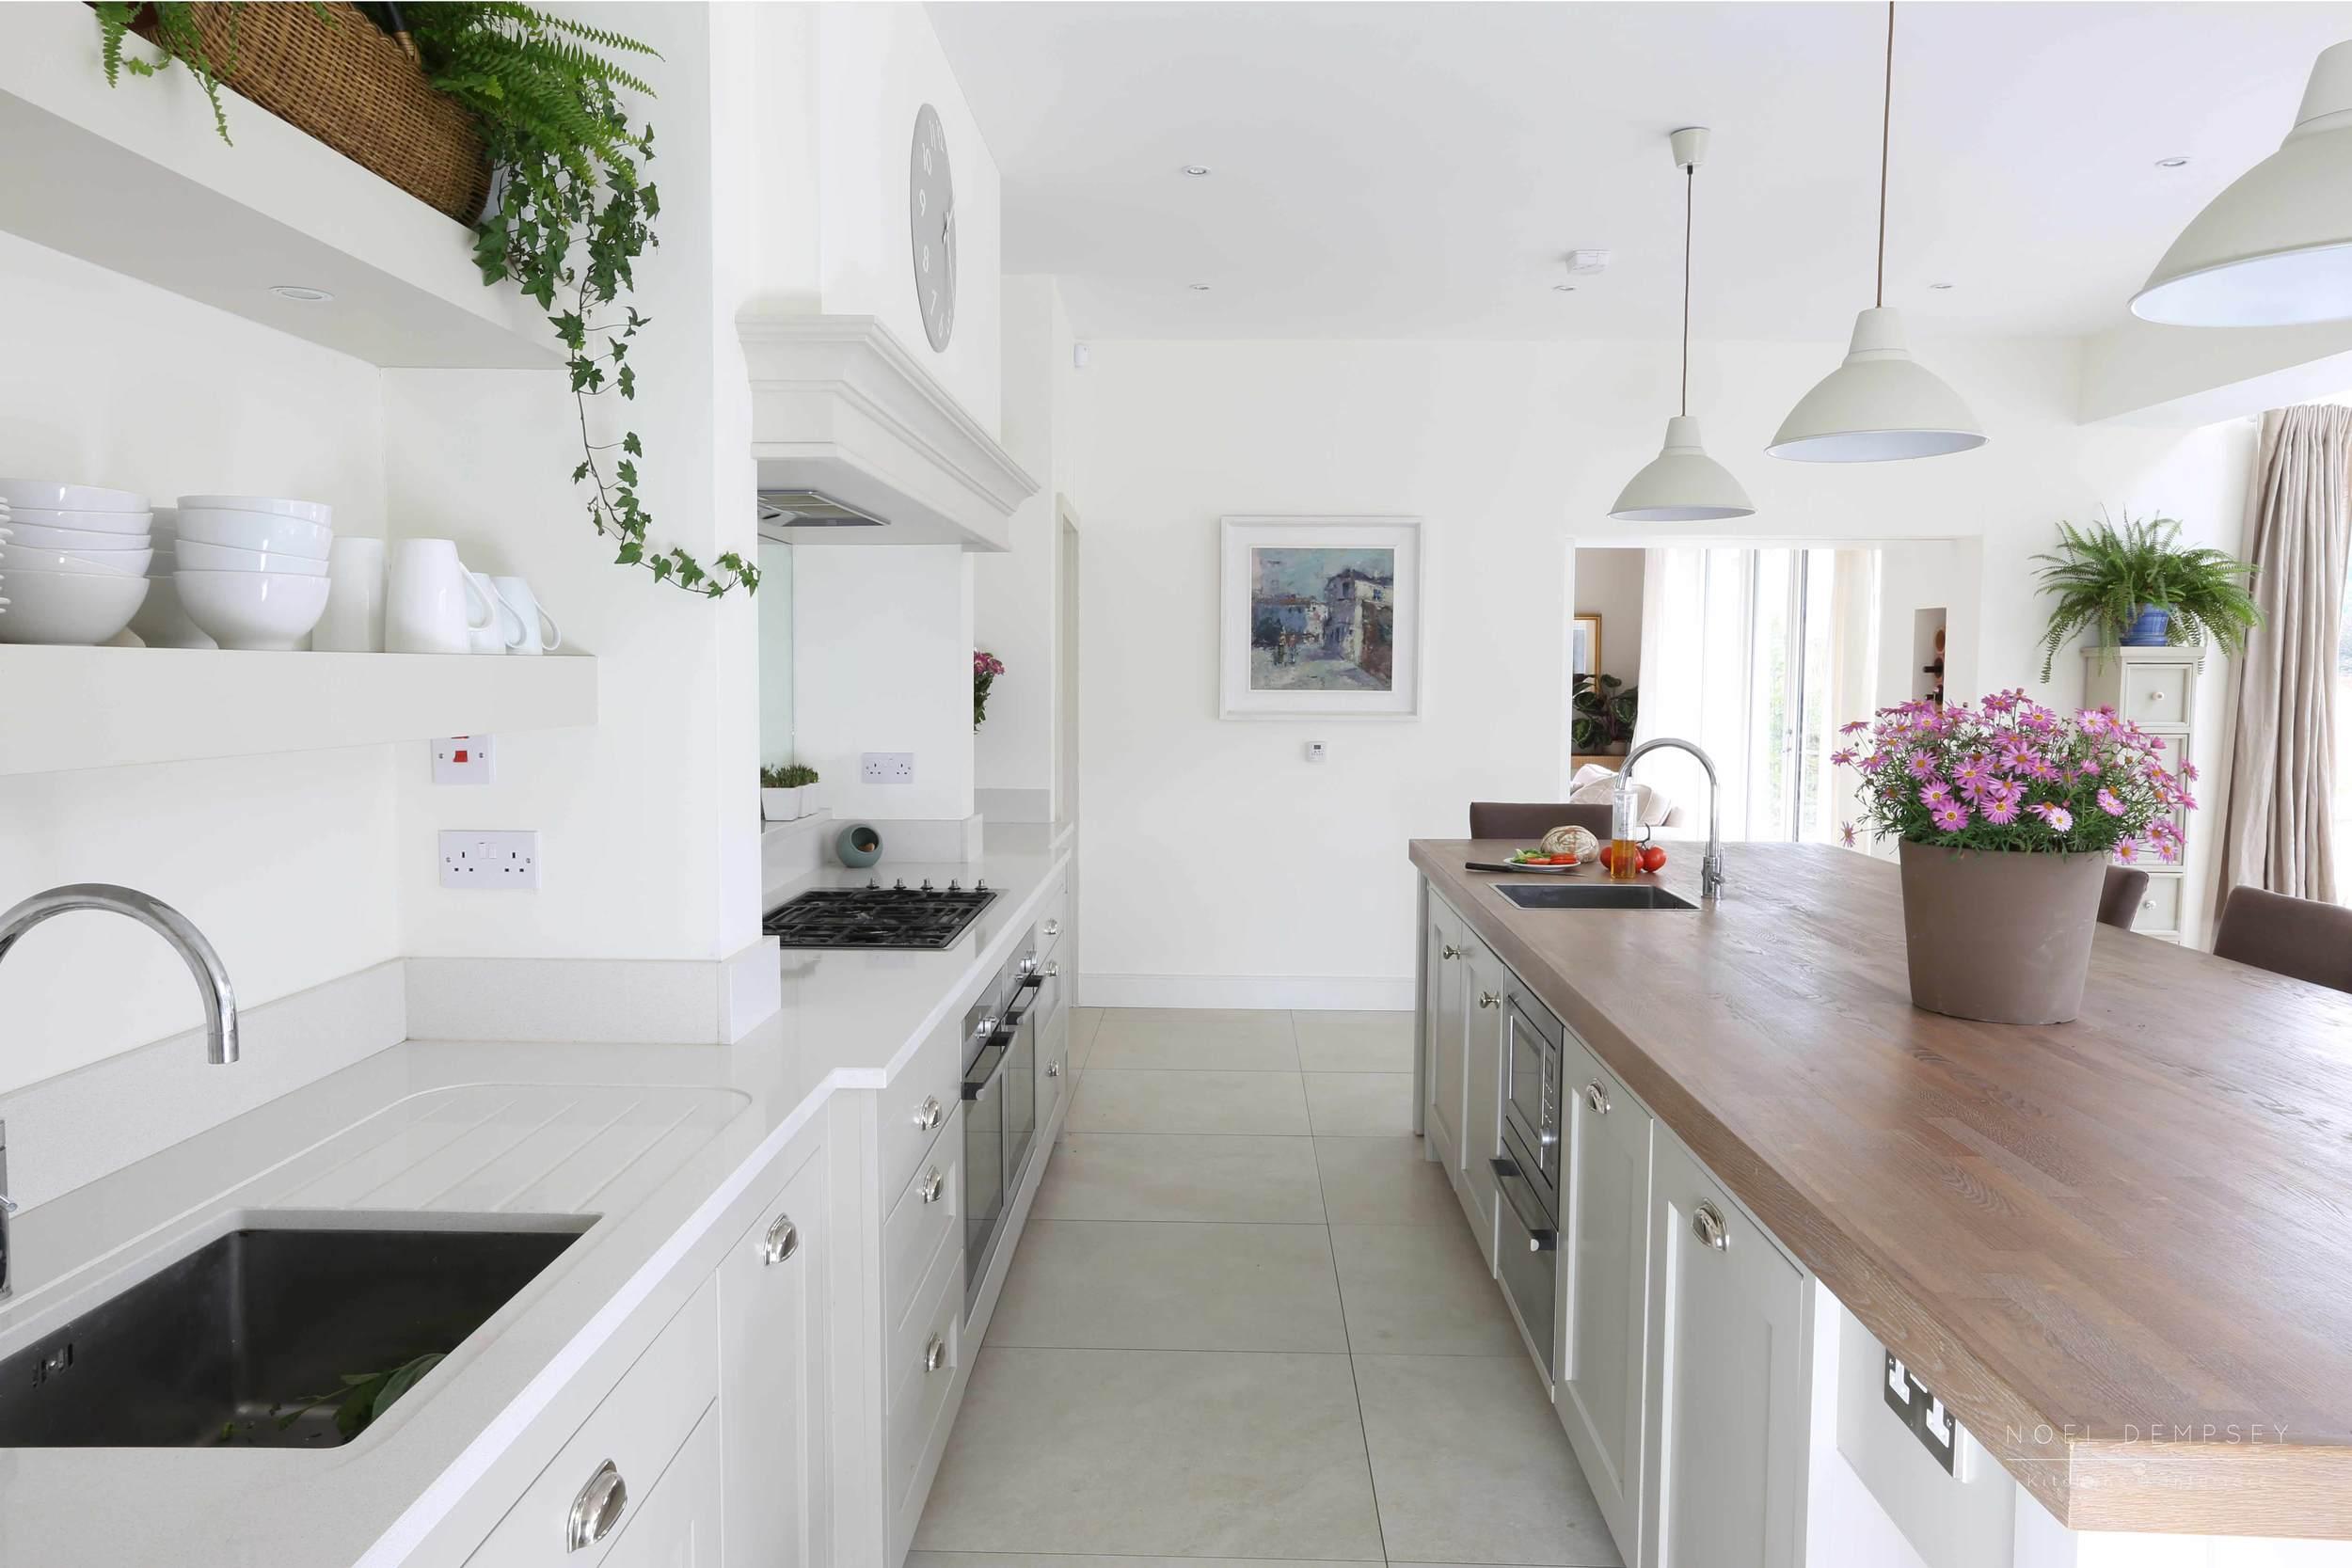 Glen-Valley-Plain-English-Painted-Kitchen-3.jpg